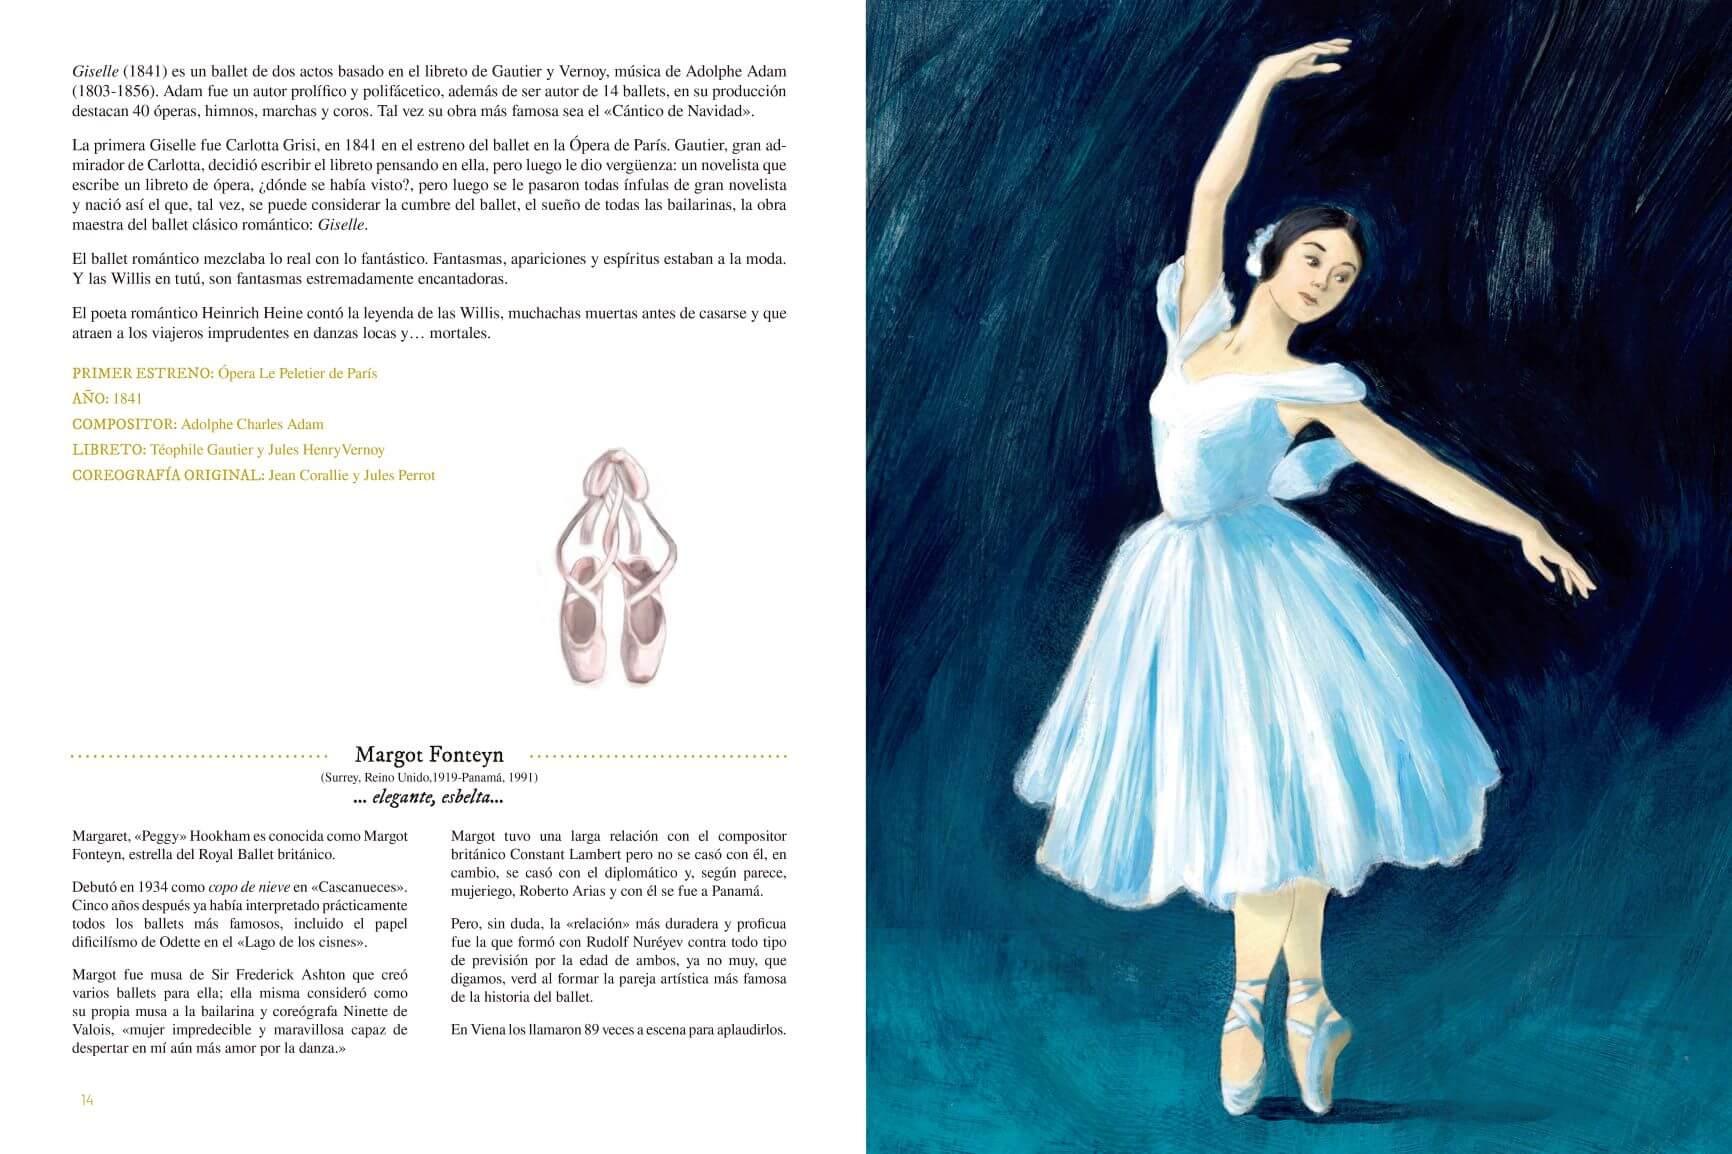 ballet spread 2